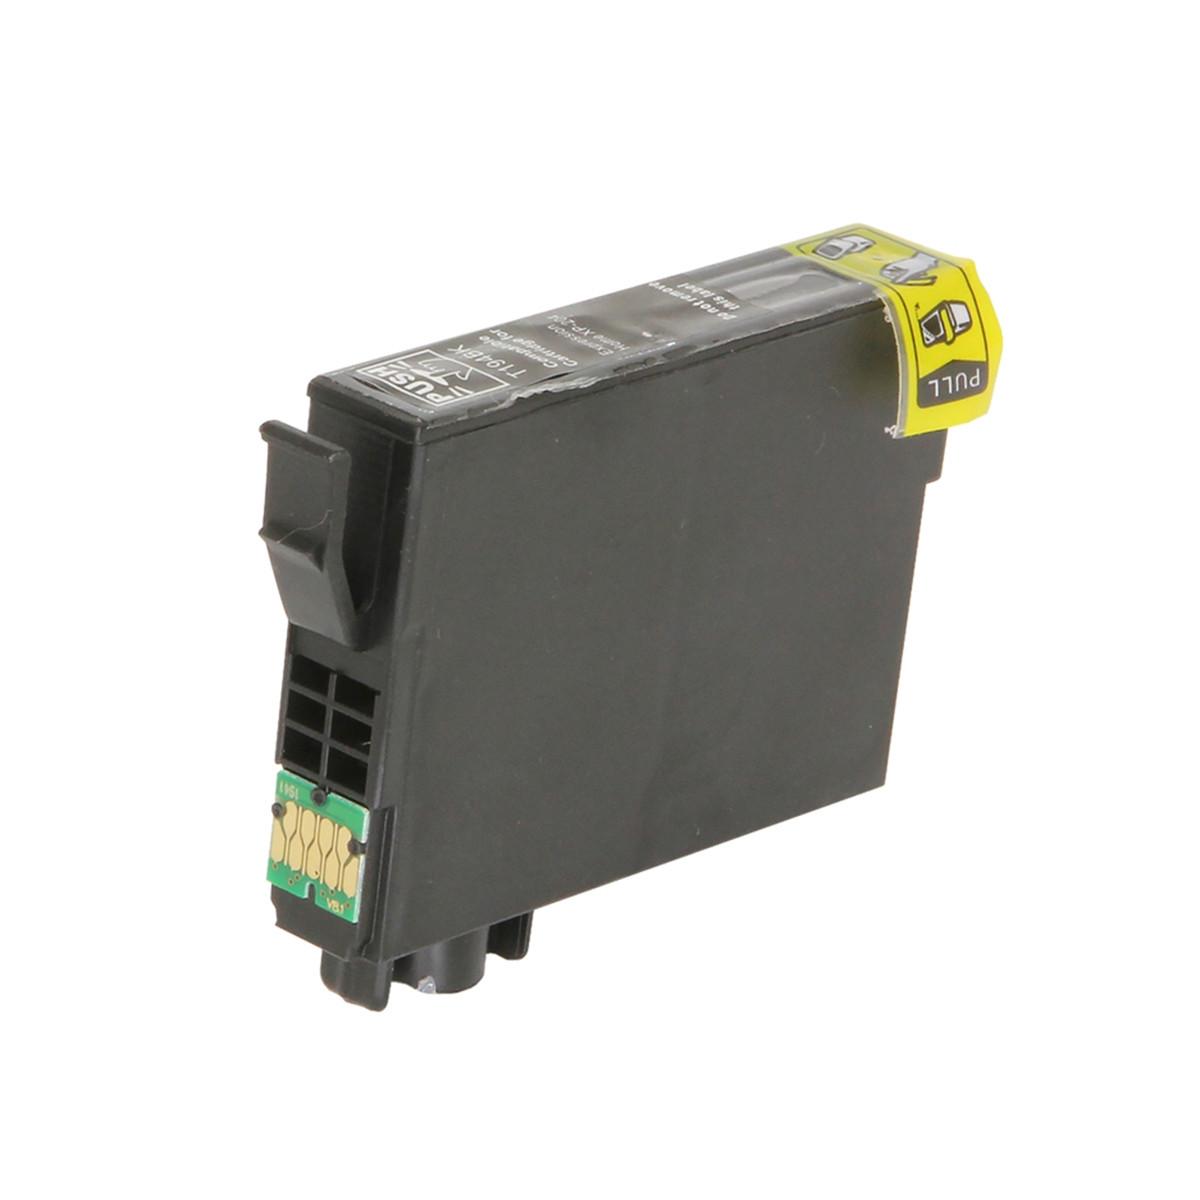 Cartucho de Tinta Compatível com Epson T194 T194120 T1941 Preto | XP204 XP 204 | 10ml